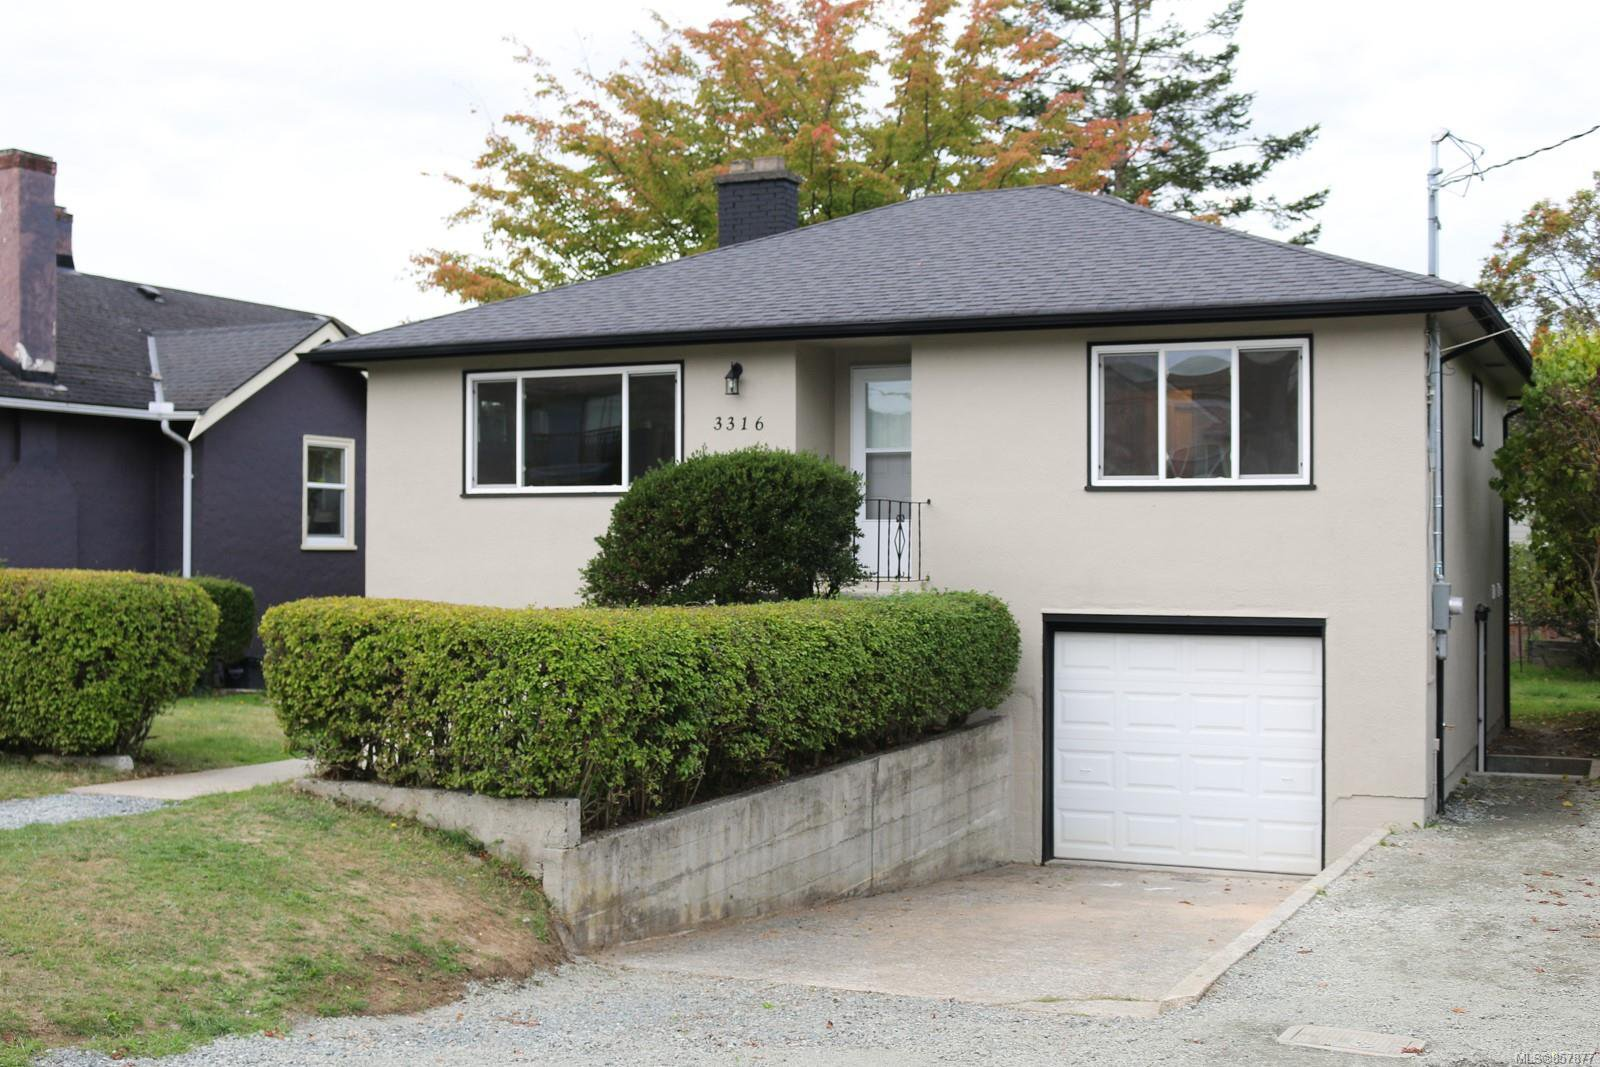 Main Photo: 3316 Aldridge St in : SE Mt Tolmie House for sale (Saanich East)  : MLS®# 857877